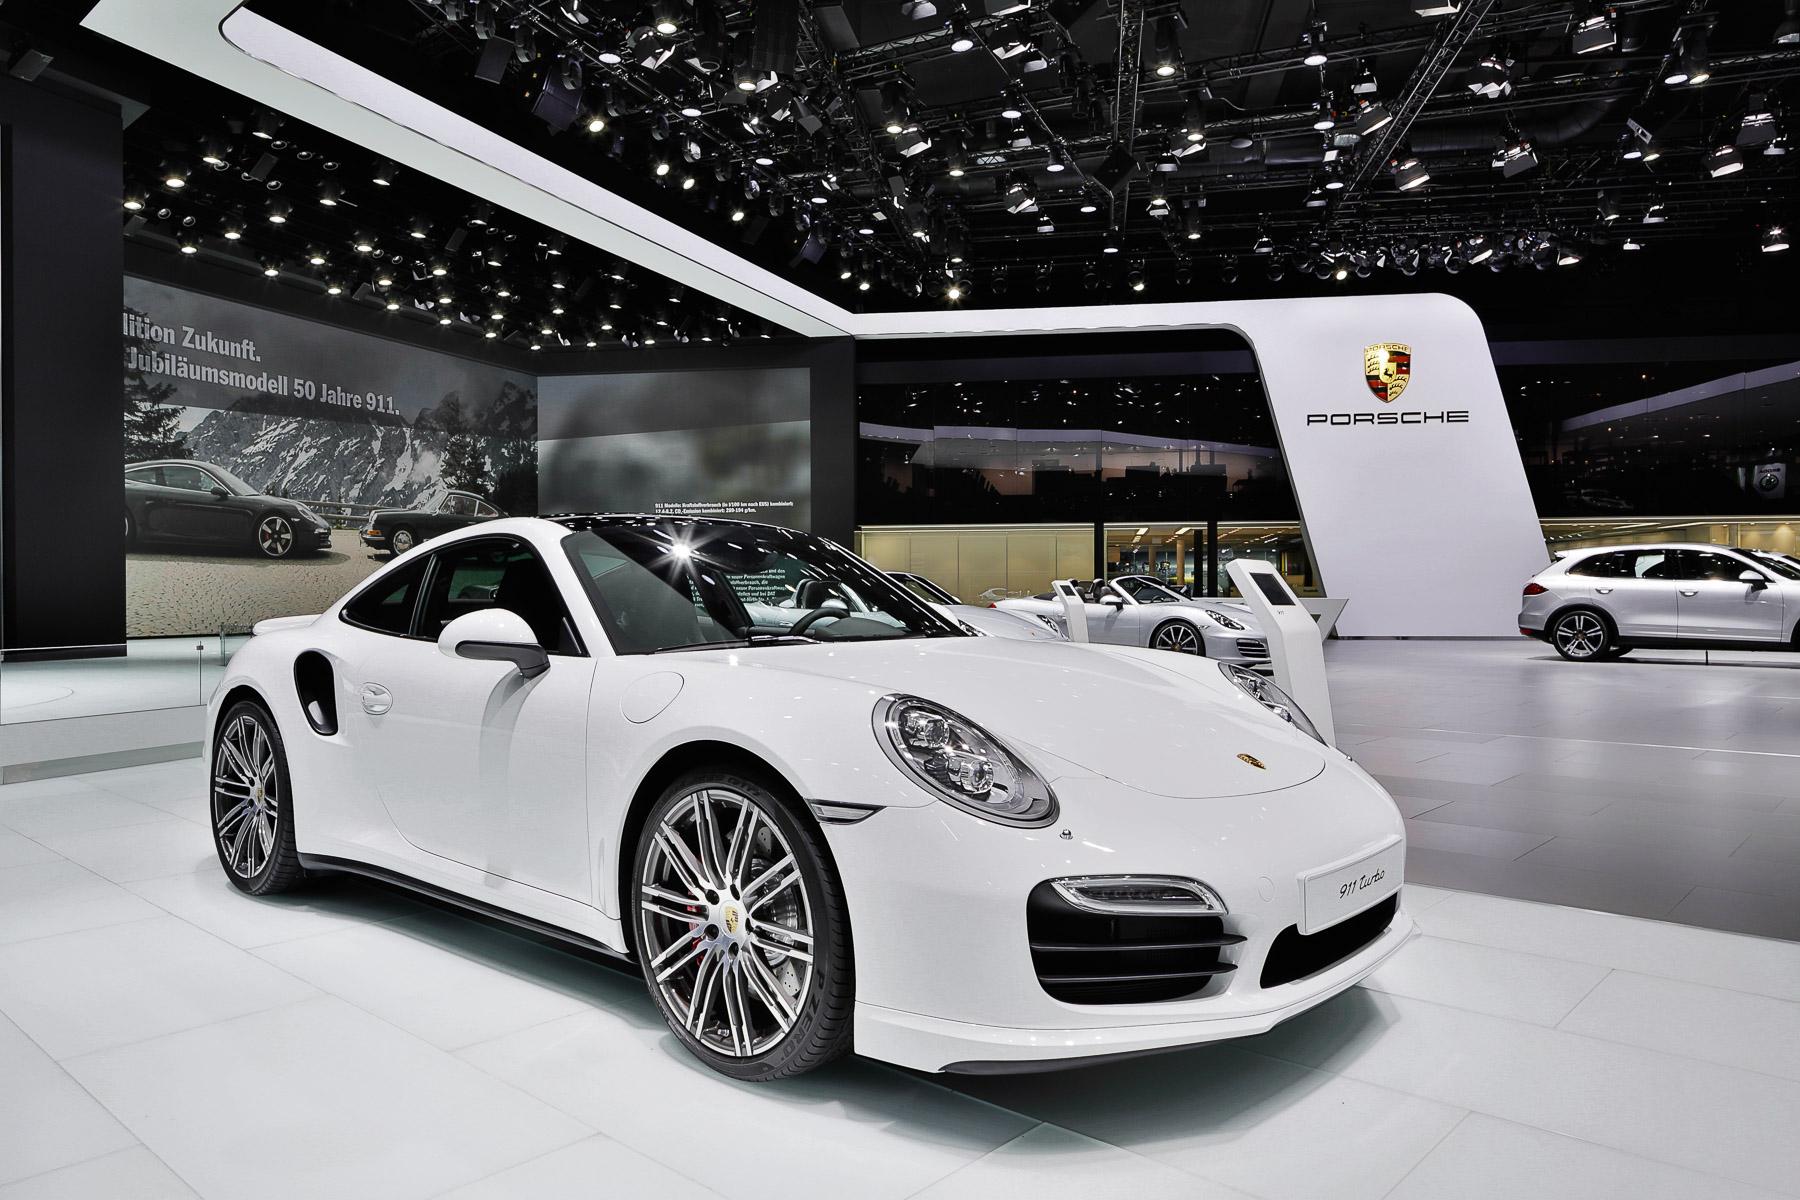 Porsche - Messestand IAA - EYECATCHME. Photography